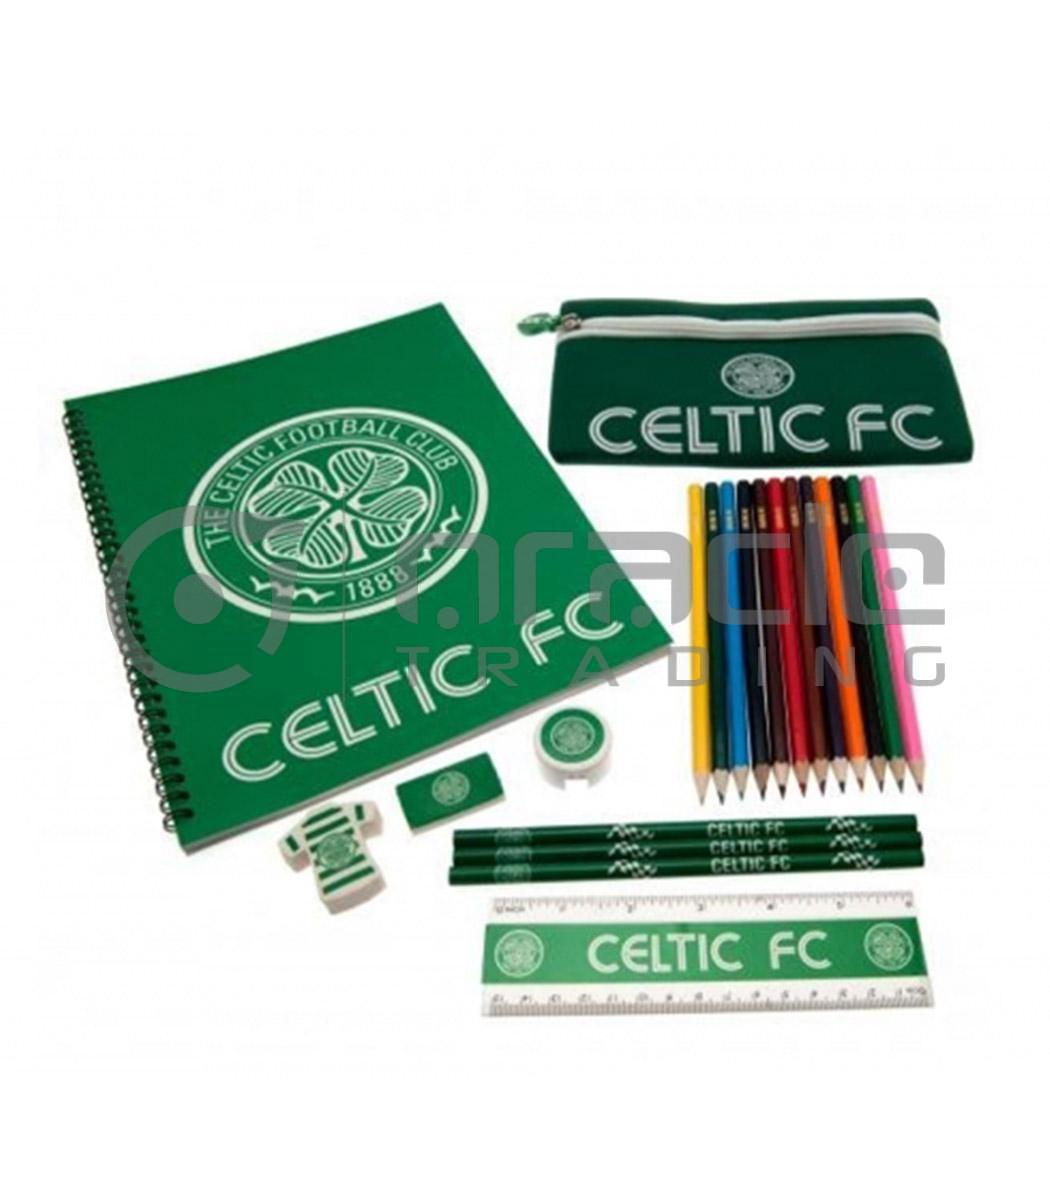 Celtic Ultimate Stationery Set